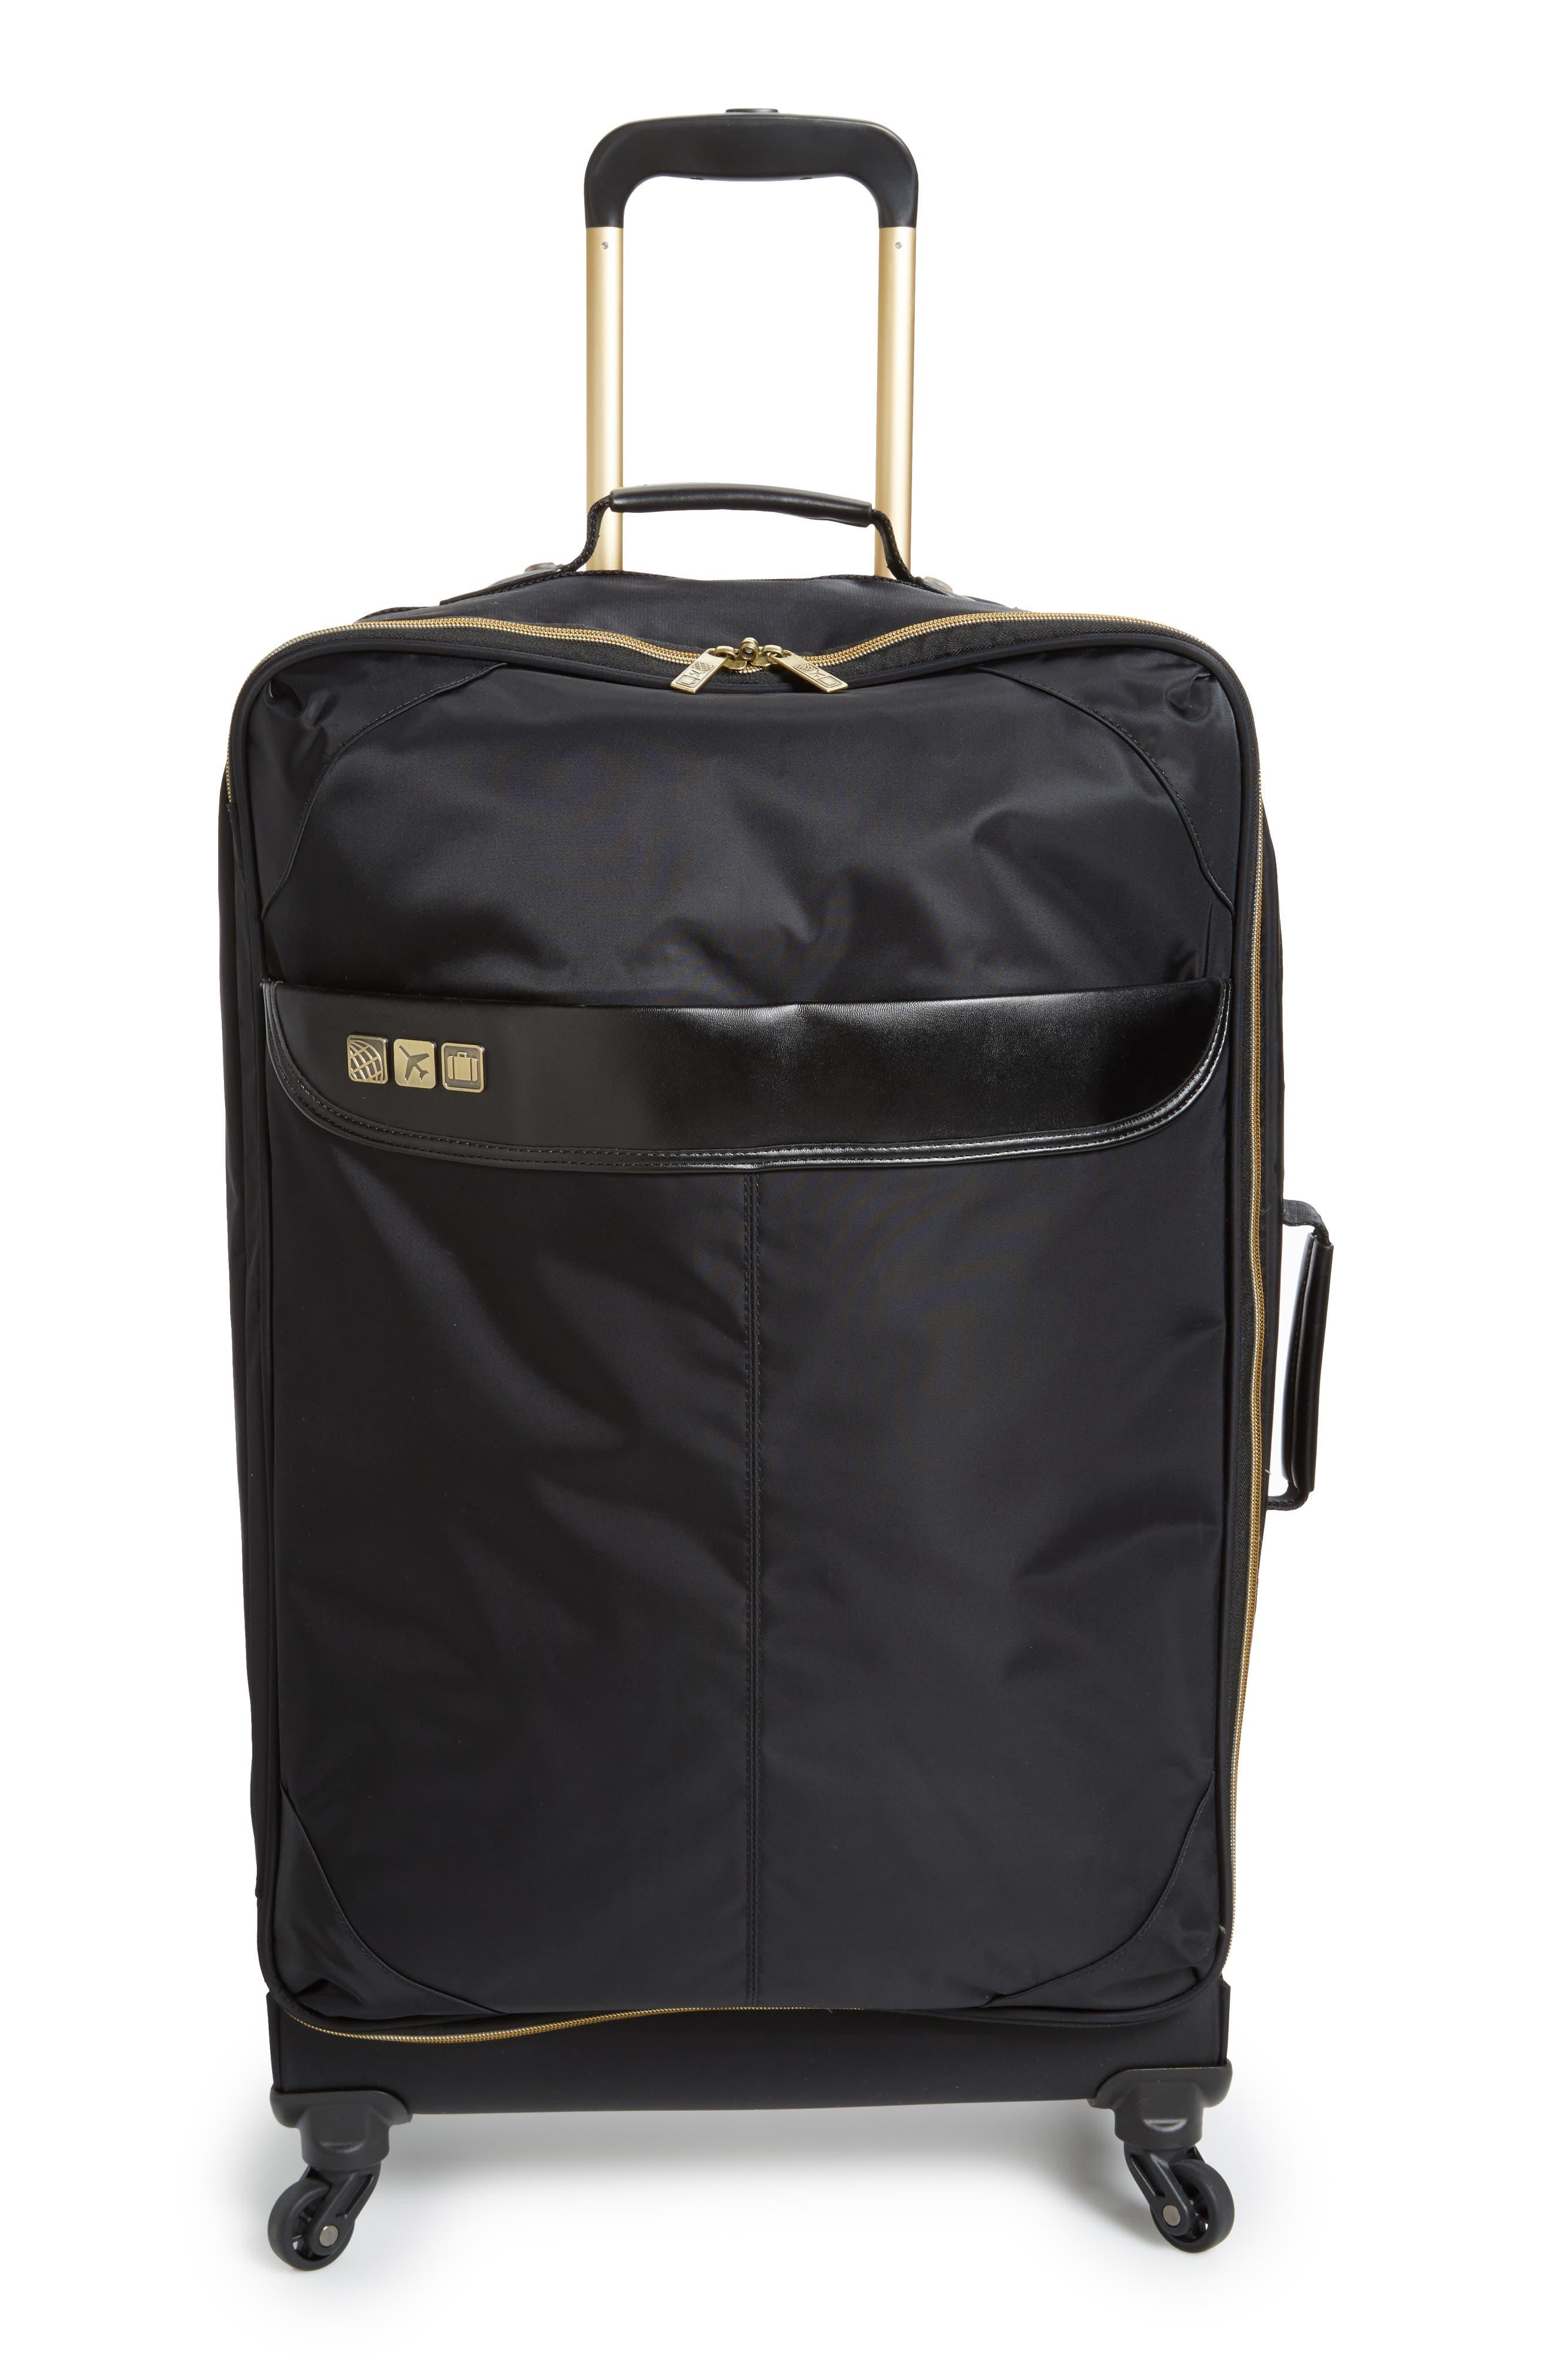 Main Image - Flight 001 Avionette 26 Inch Rolling Suitcase